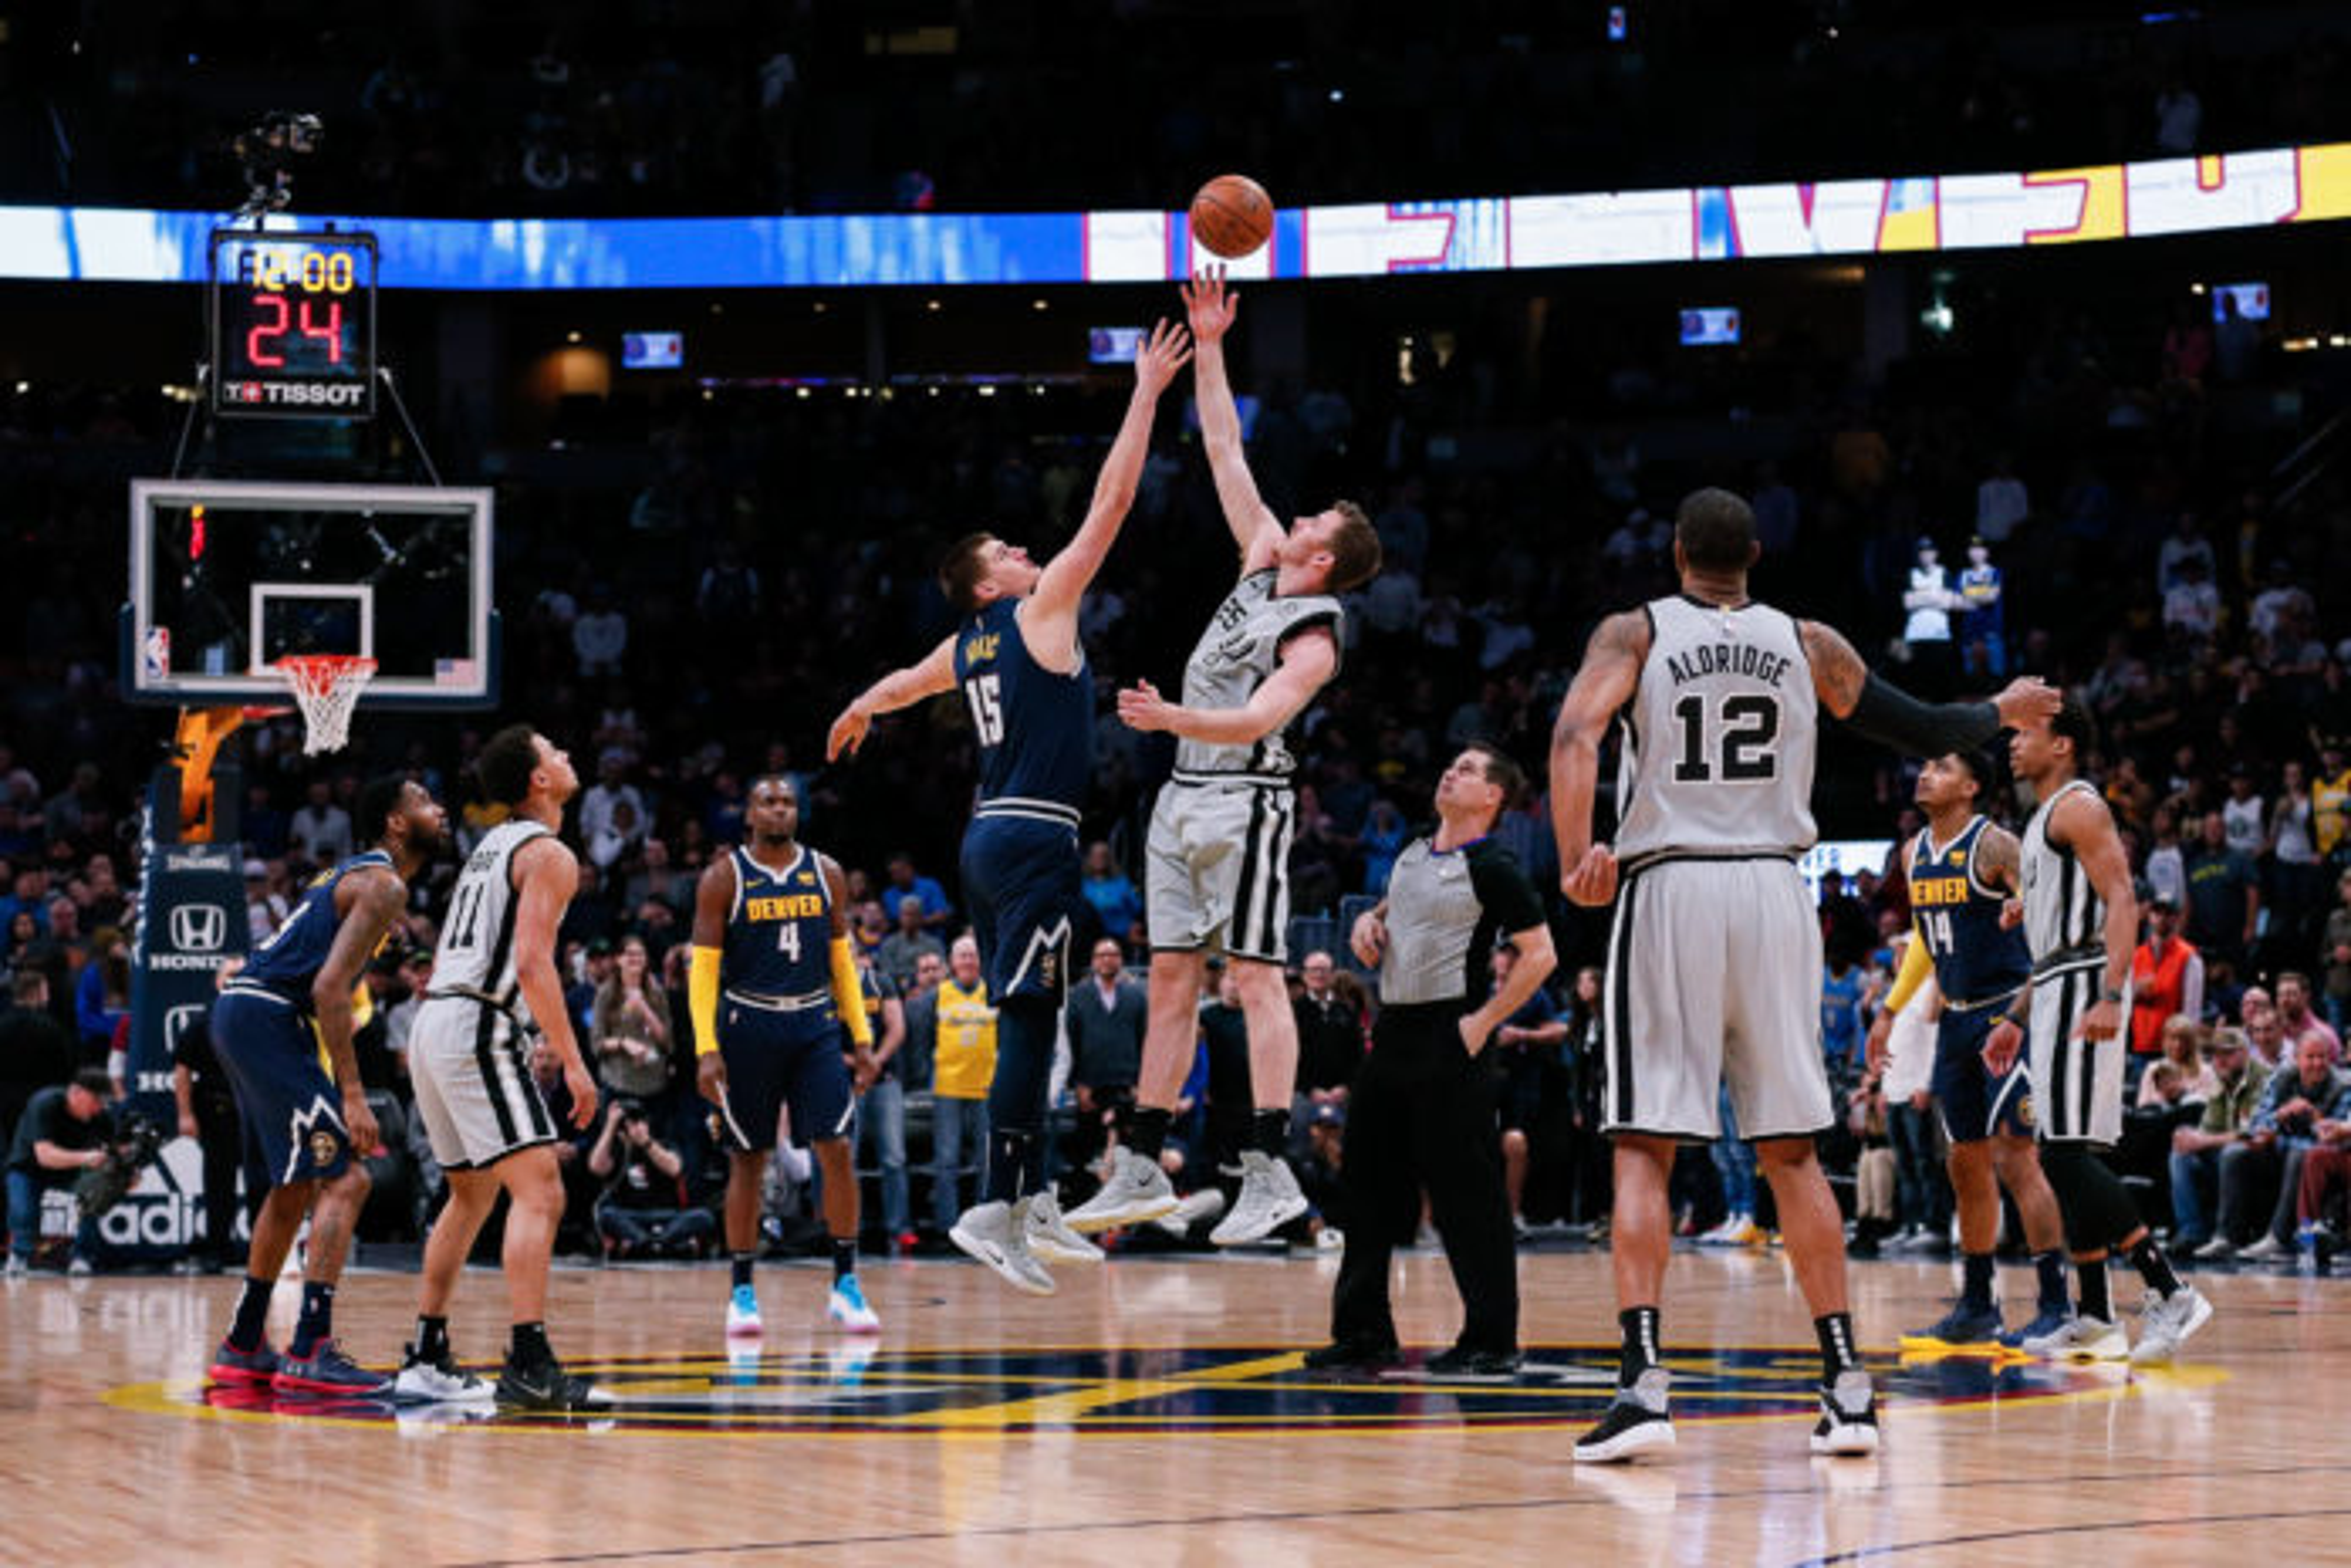 San Antonio Spurs center Jakob Poeltl (25) wins the tip off against Denver Nuggets center Nikola Jokic (15) in the first quarter at the Pepsi Center